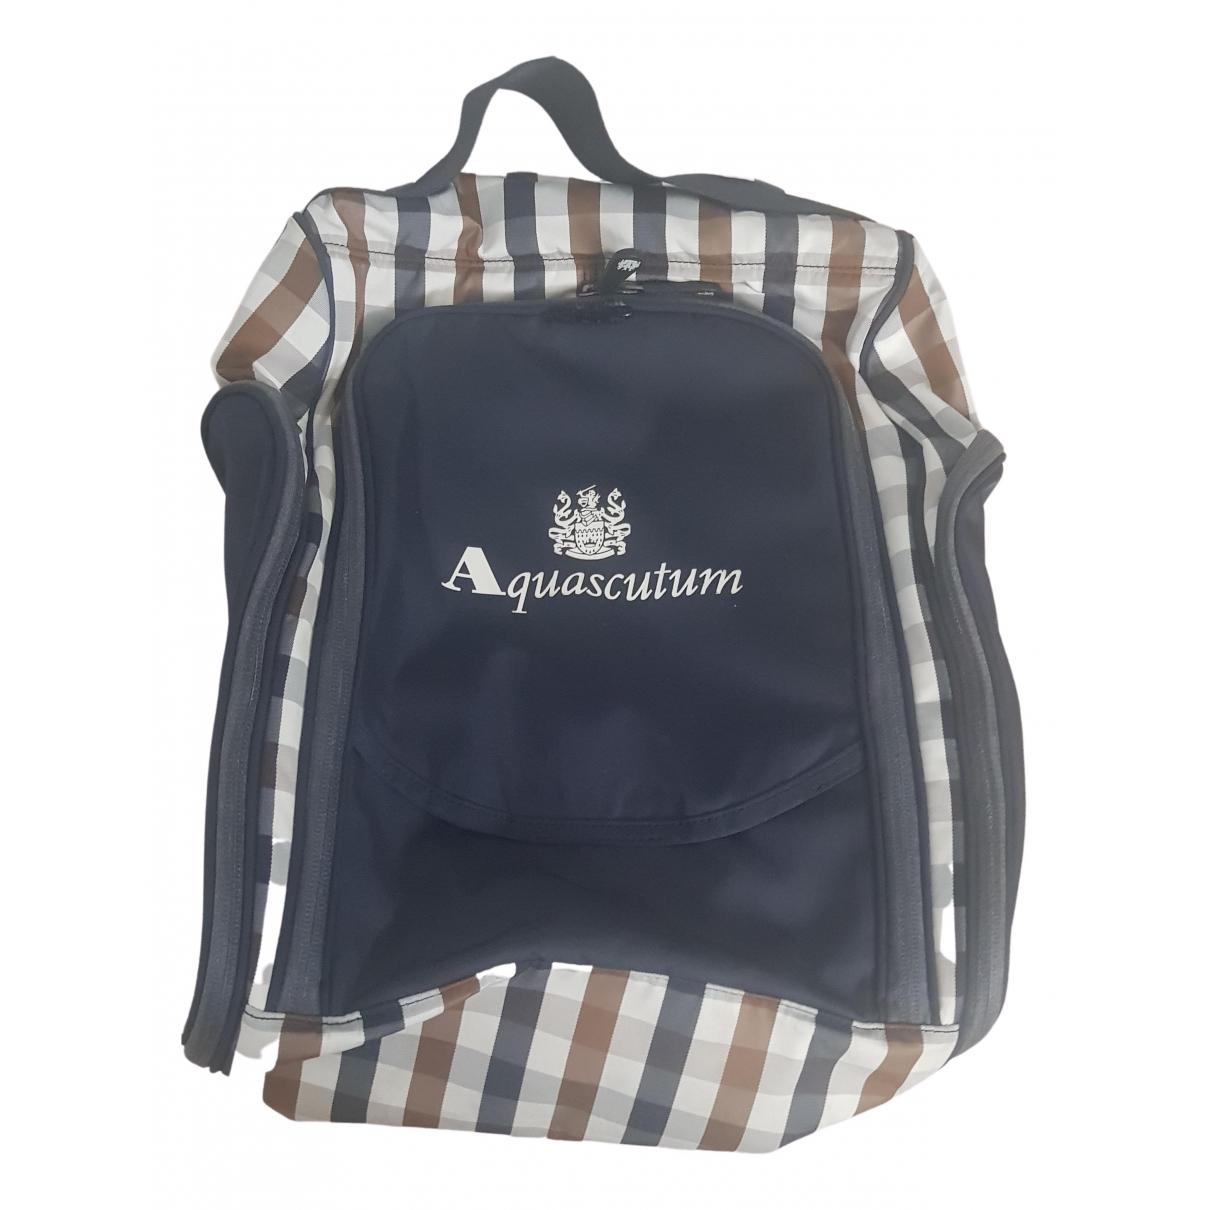 Aquascutum - Sac de voyage   pour femme - bleu